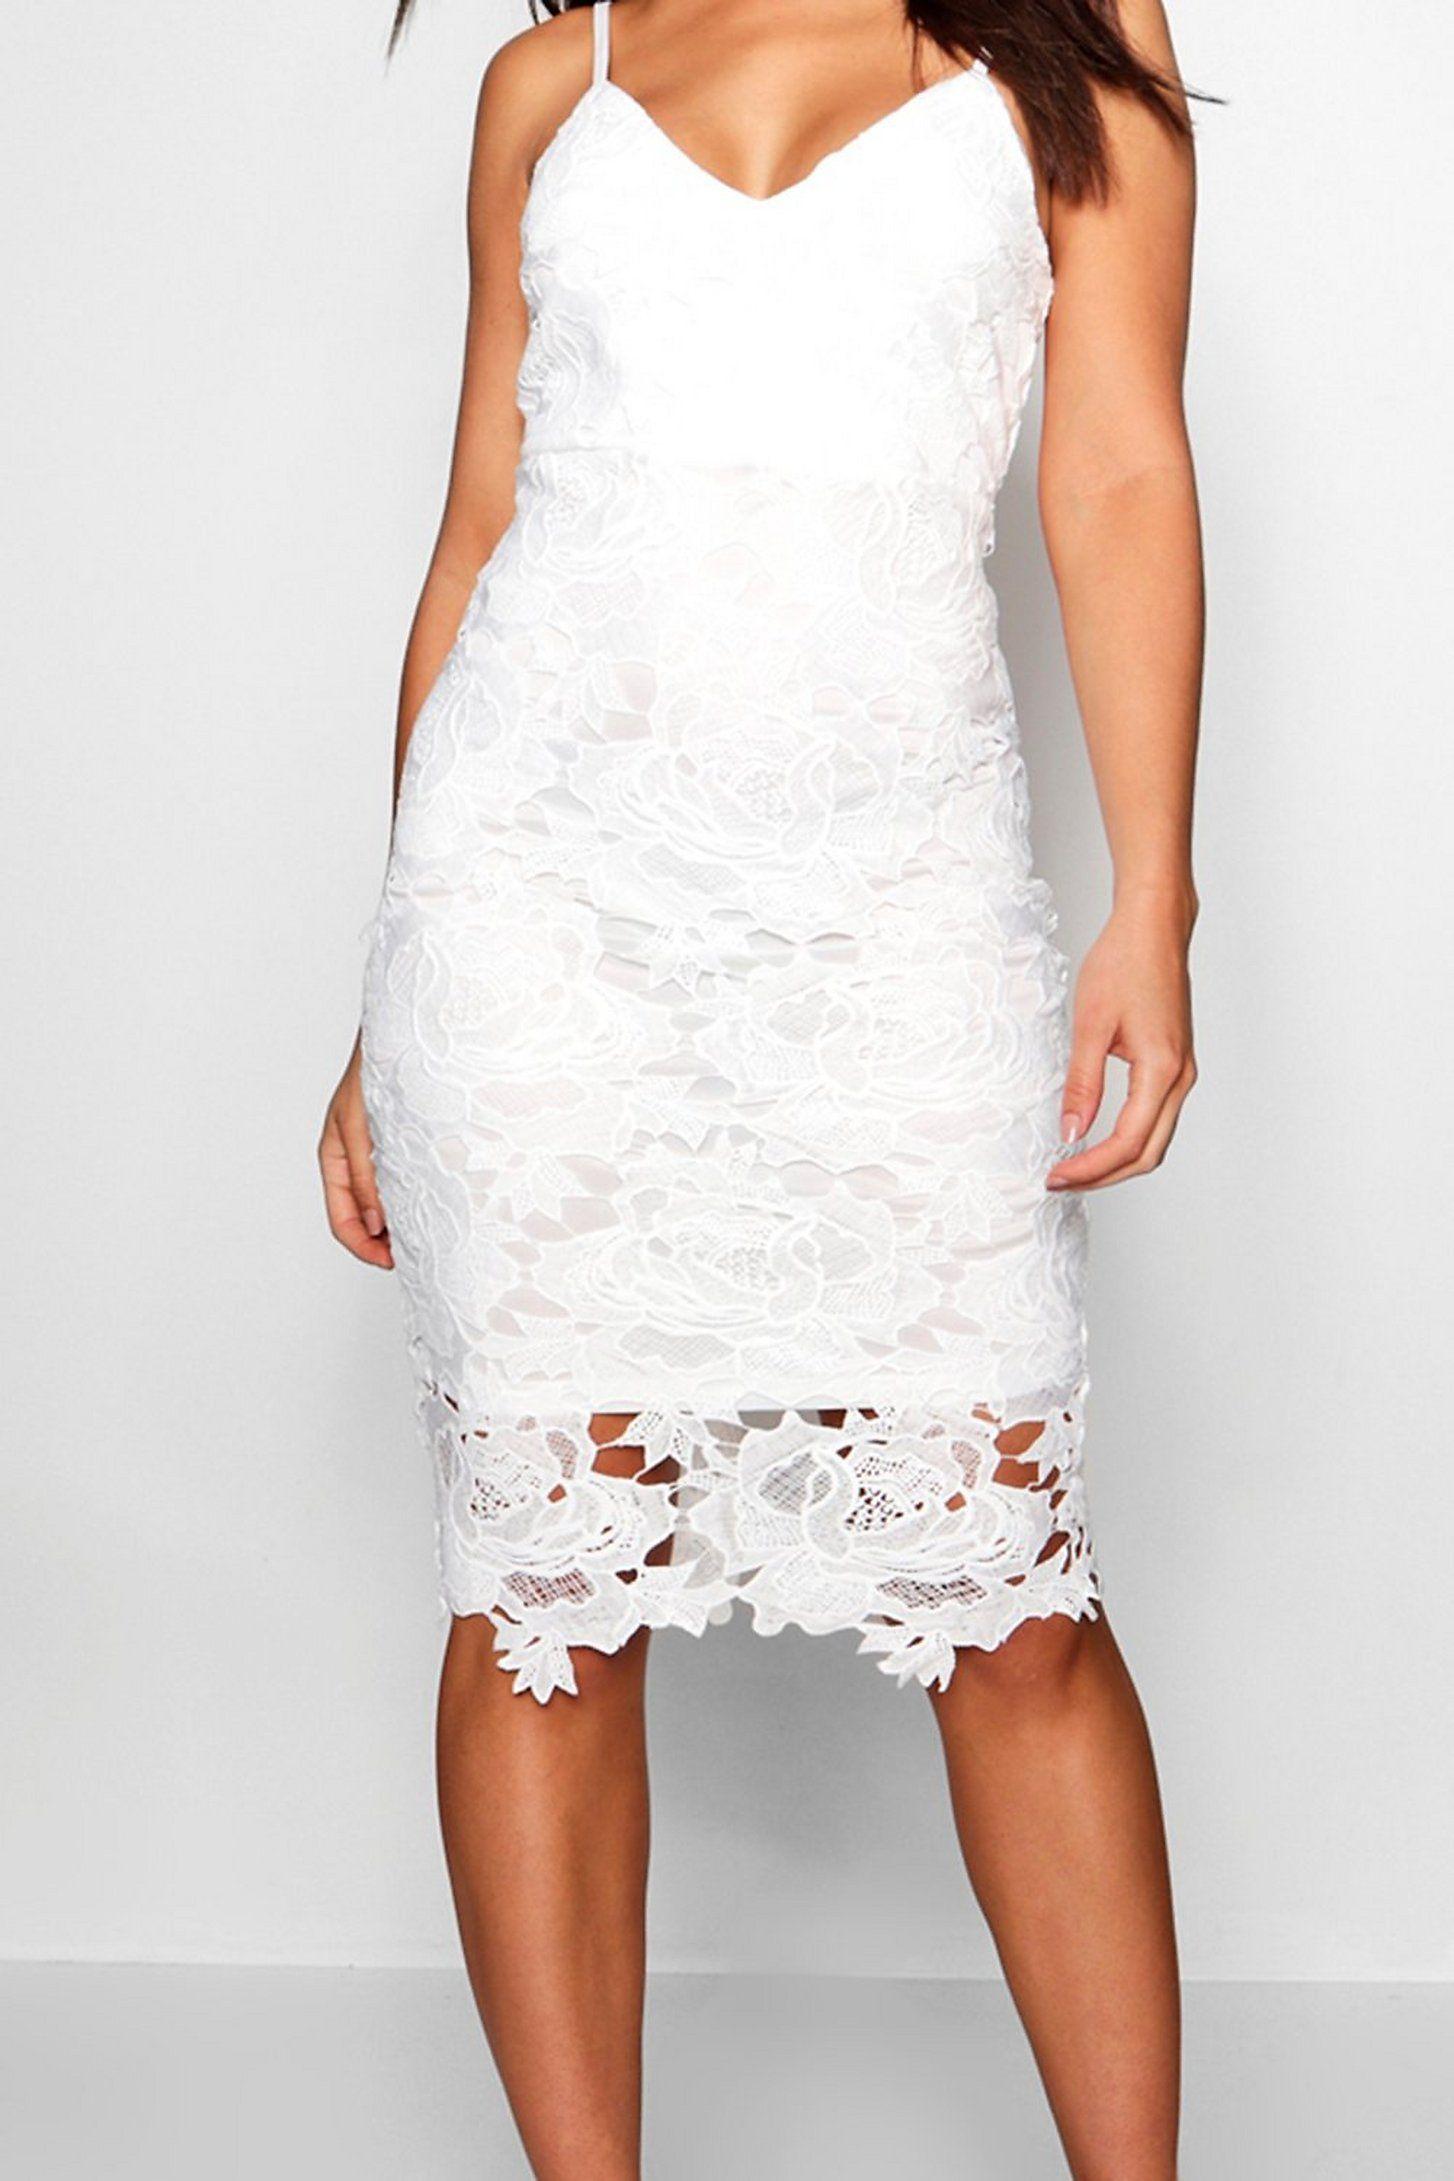 Boutique Crochet Lace Strappy Midi Dress Boohoo In 2021 Midi Dress Bodycon Lace Midi Dress Midi Dress [ 2181 x 1454 Pixel ]